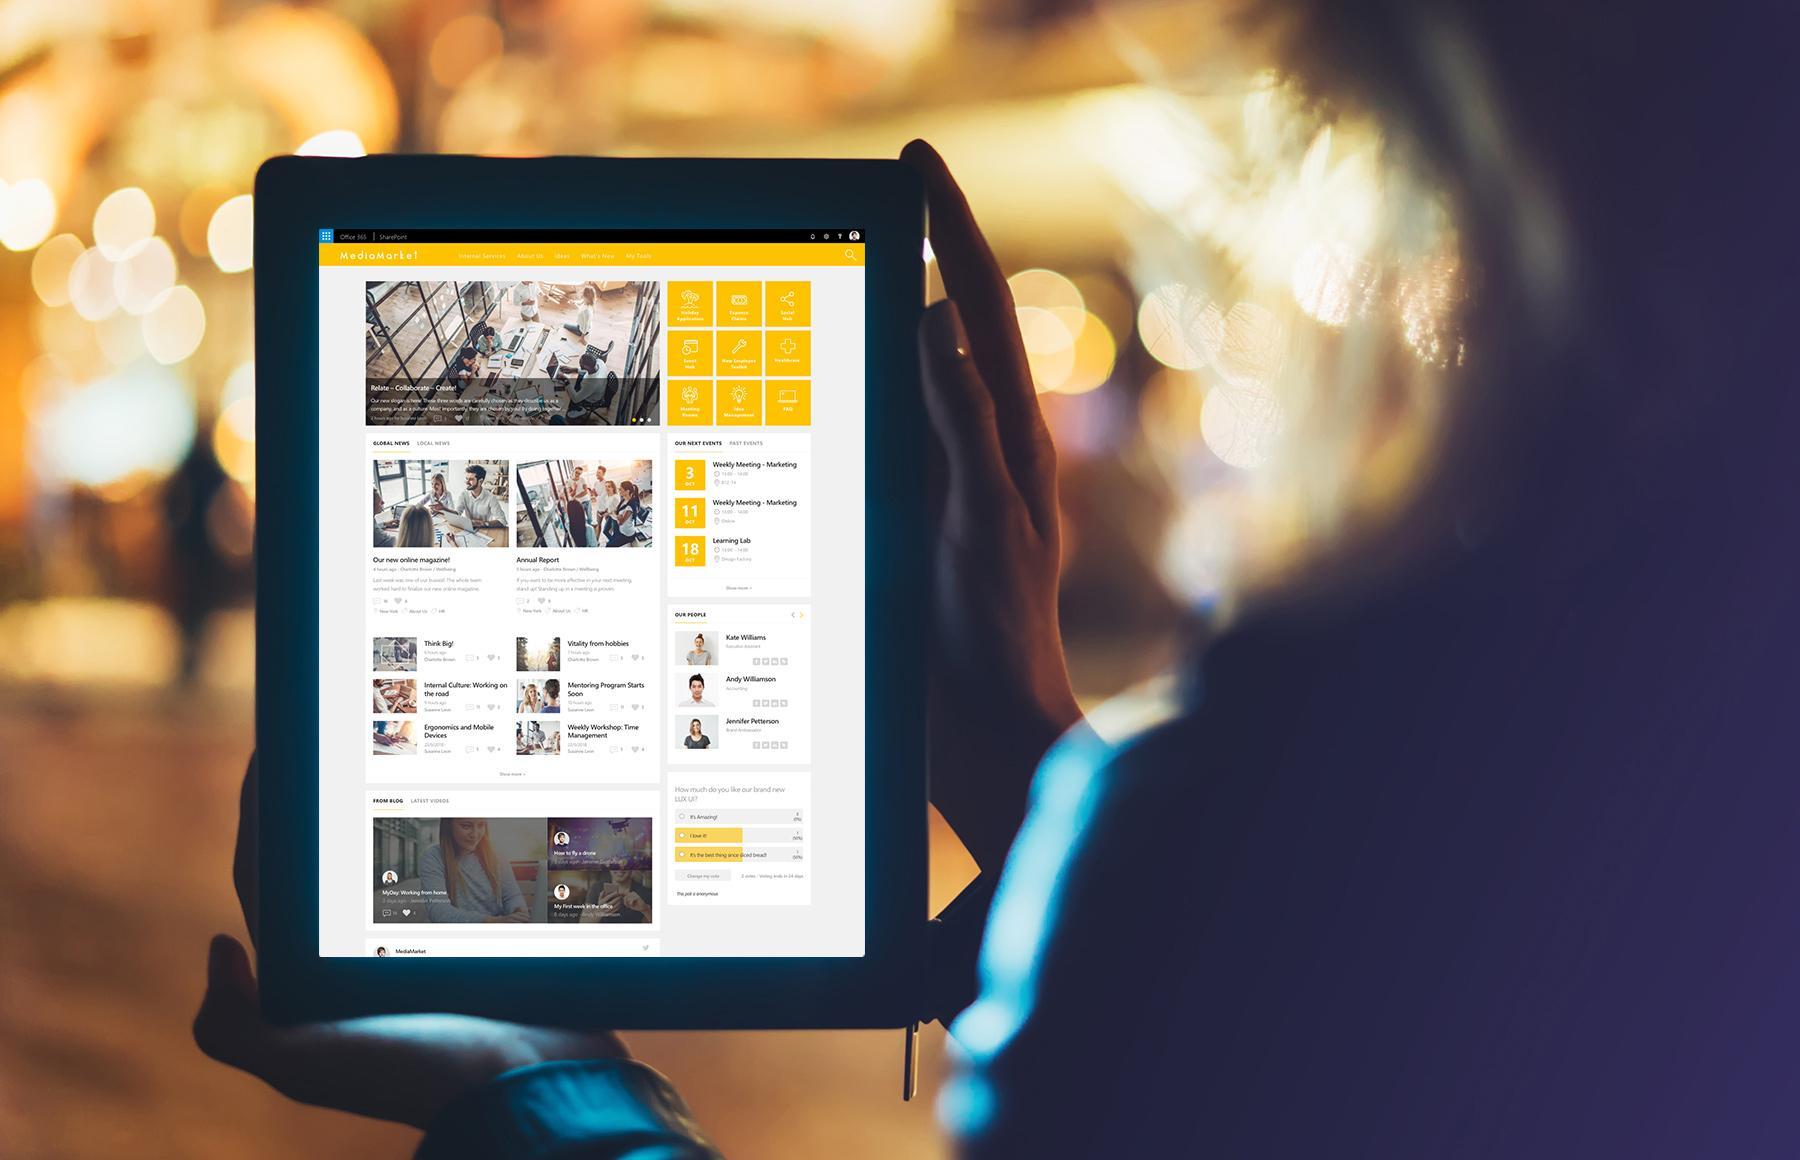 Valo Office 365 Intranet